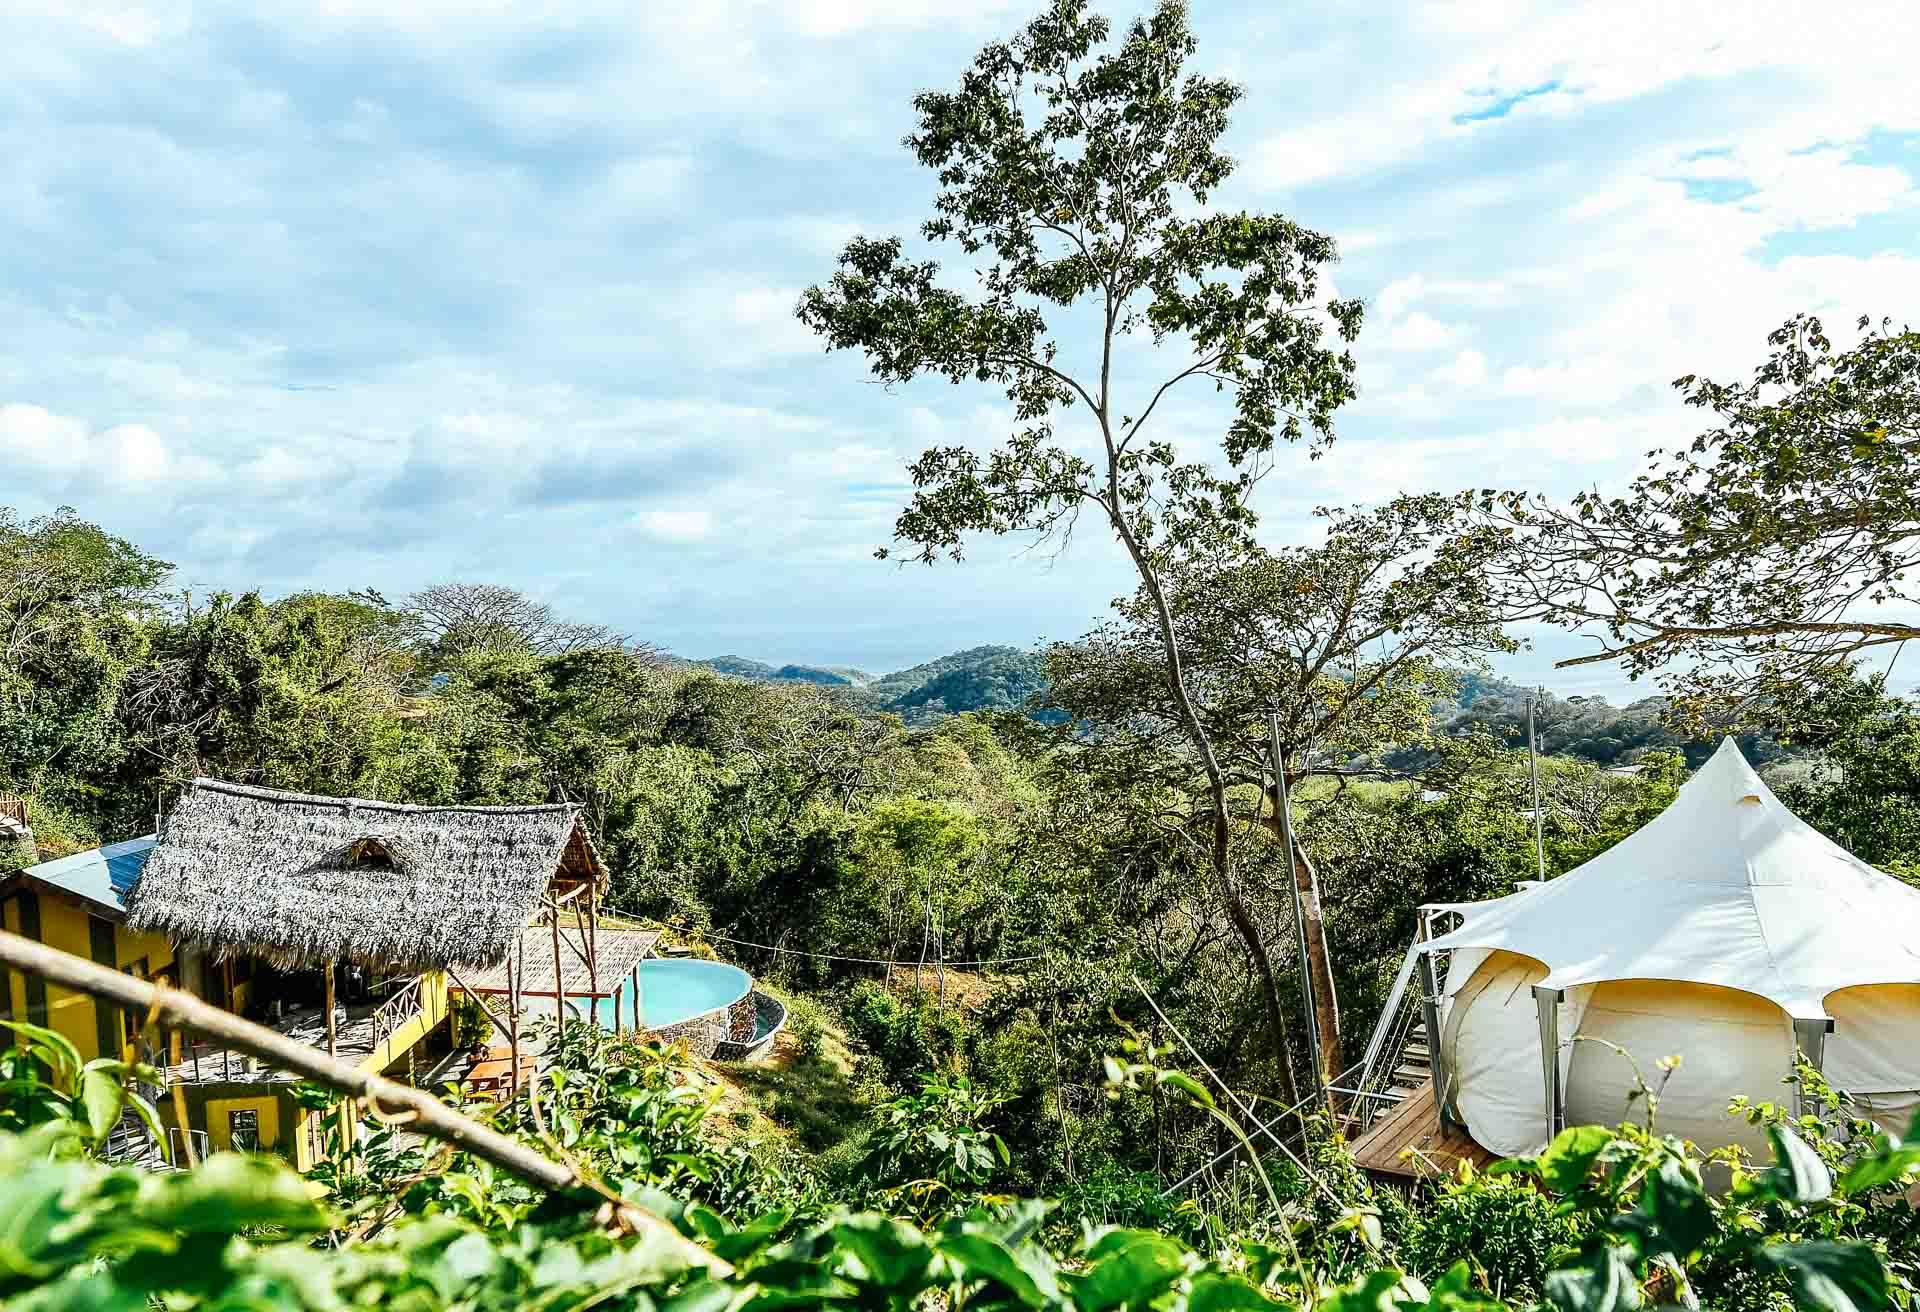 8 day Playa Maderas glamping surf and yoga camp in Nicaragua